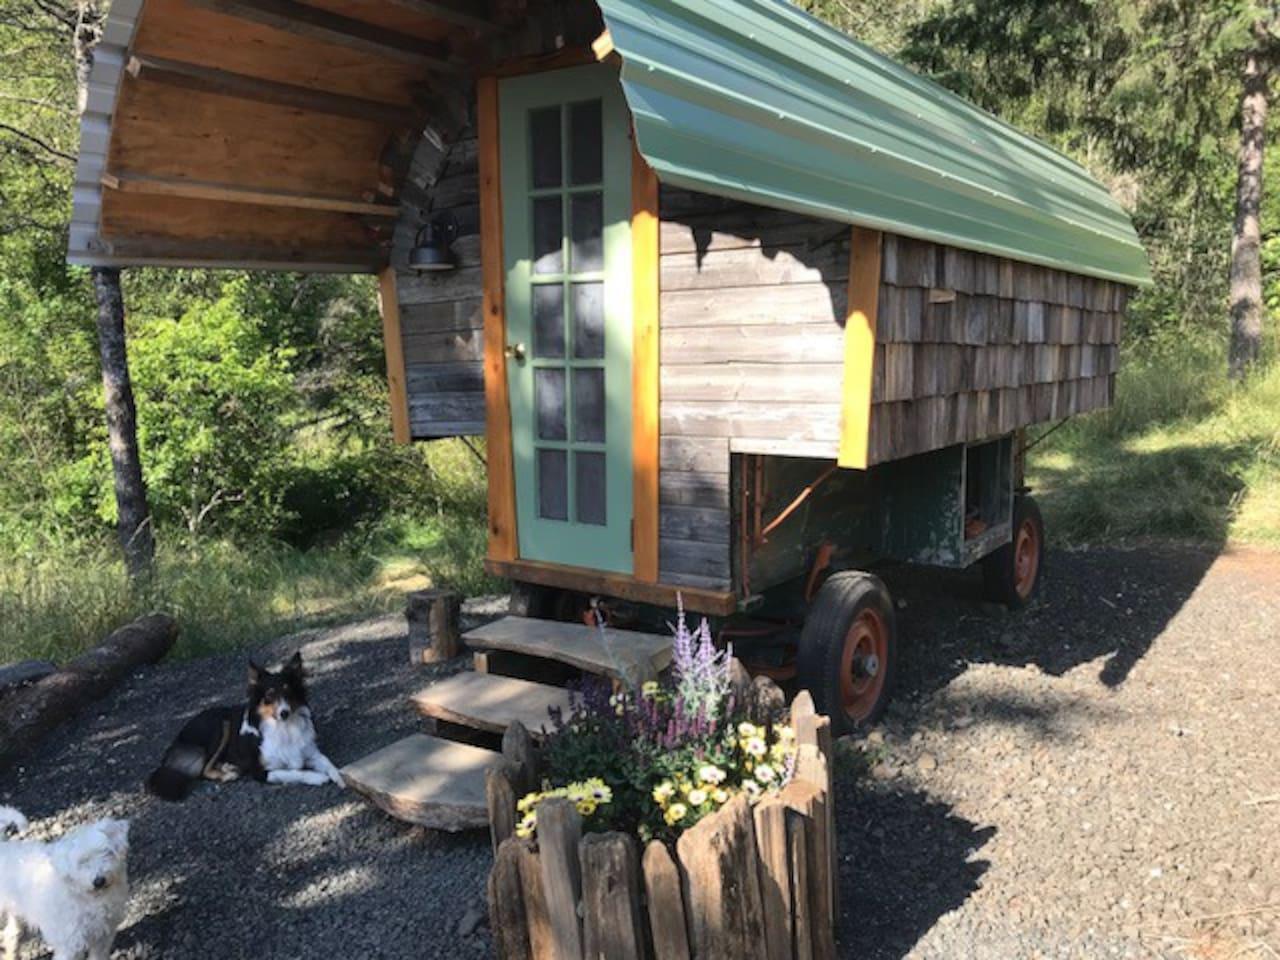 Sheepherder's Wagon #2